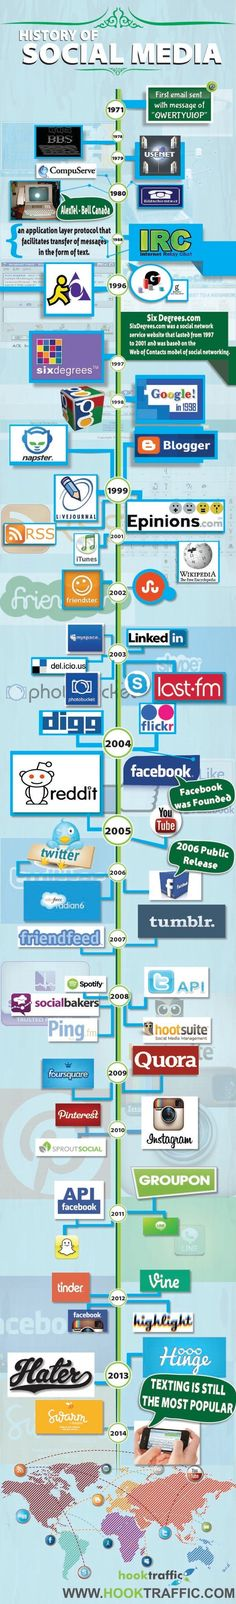 History of Social Media    #infographic #SocialMedia #History